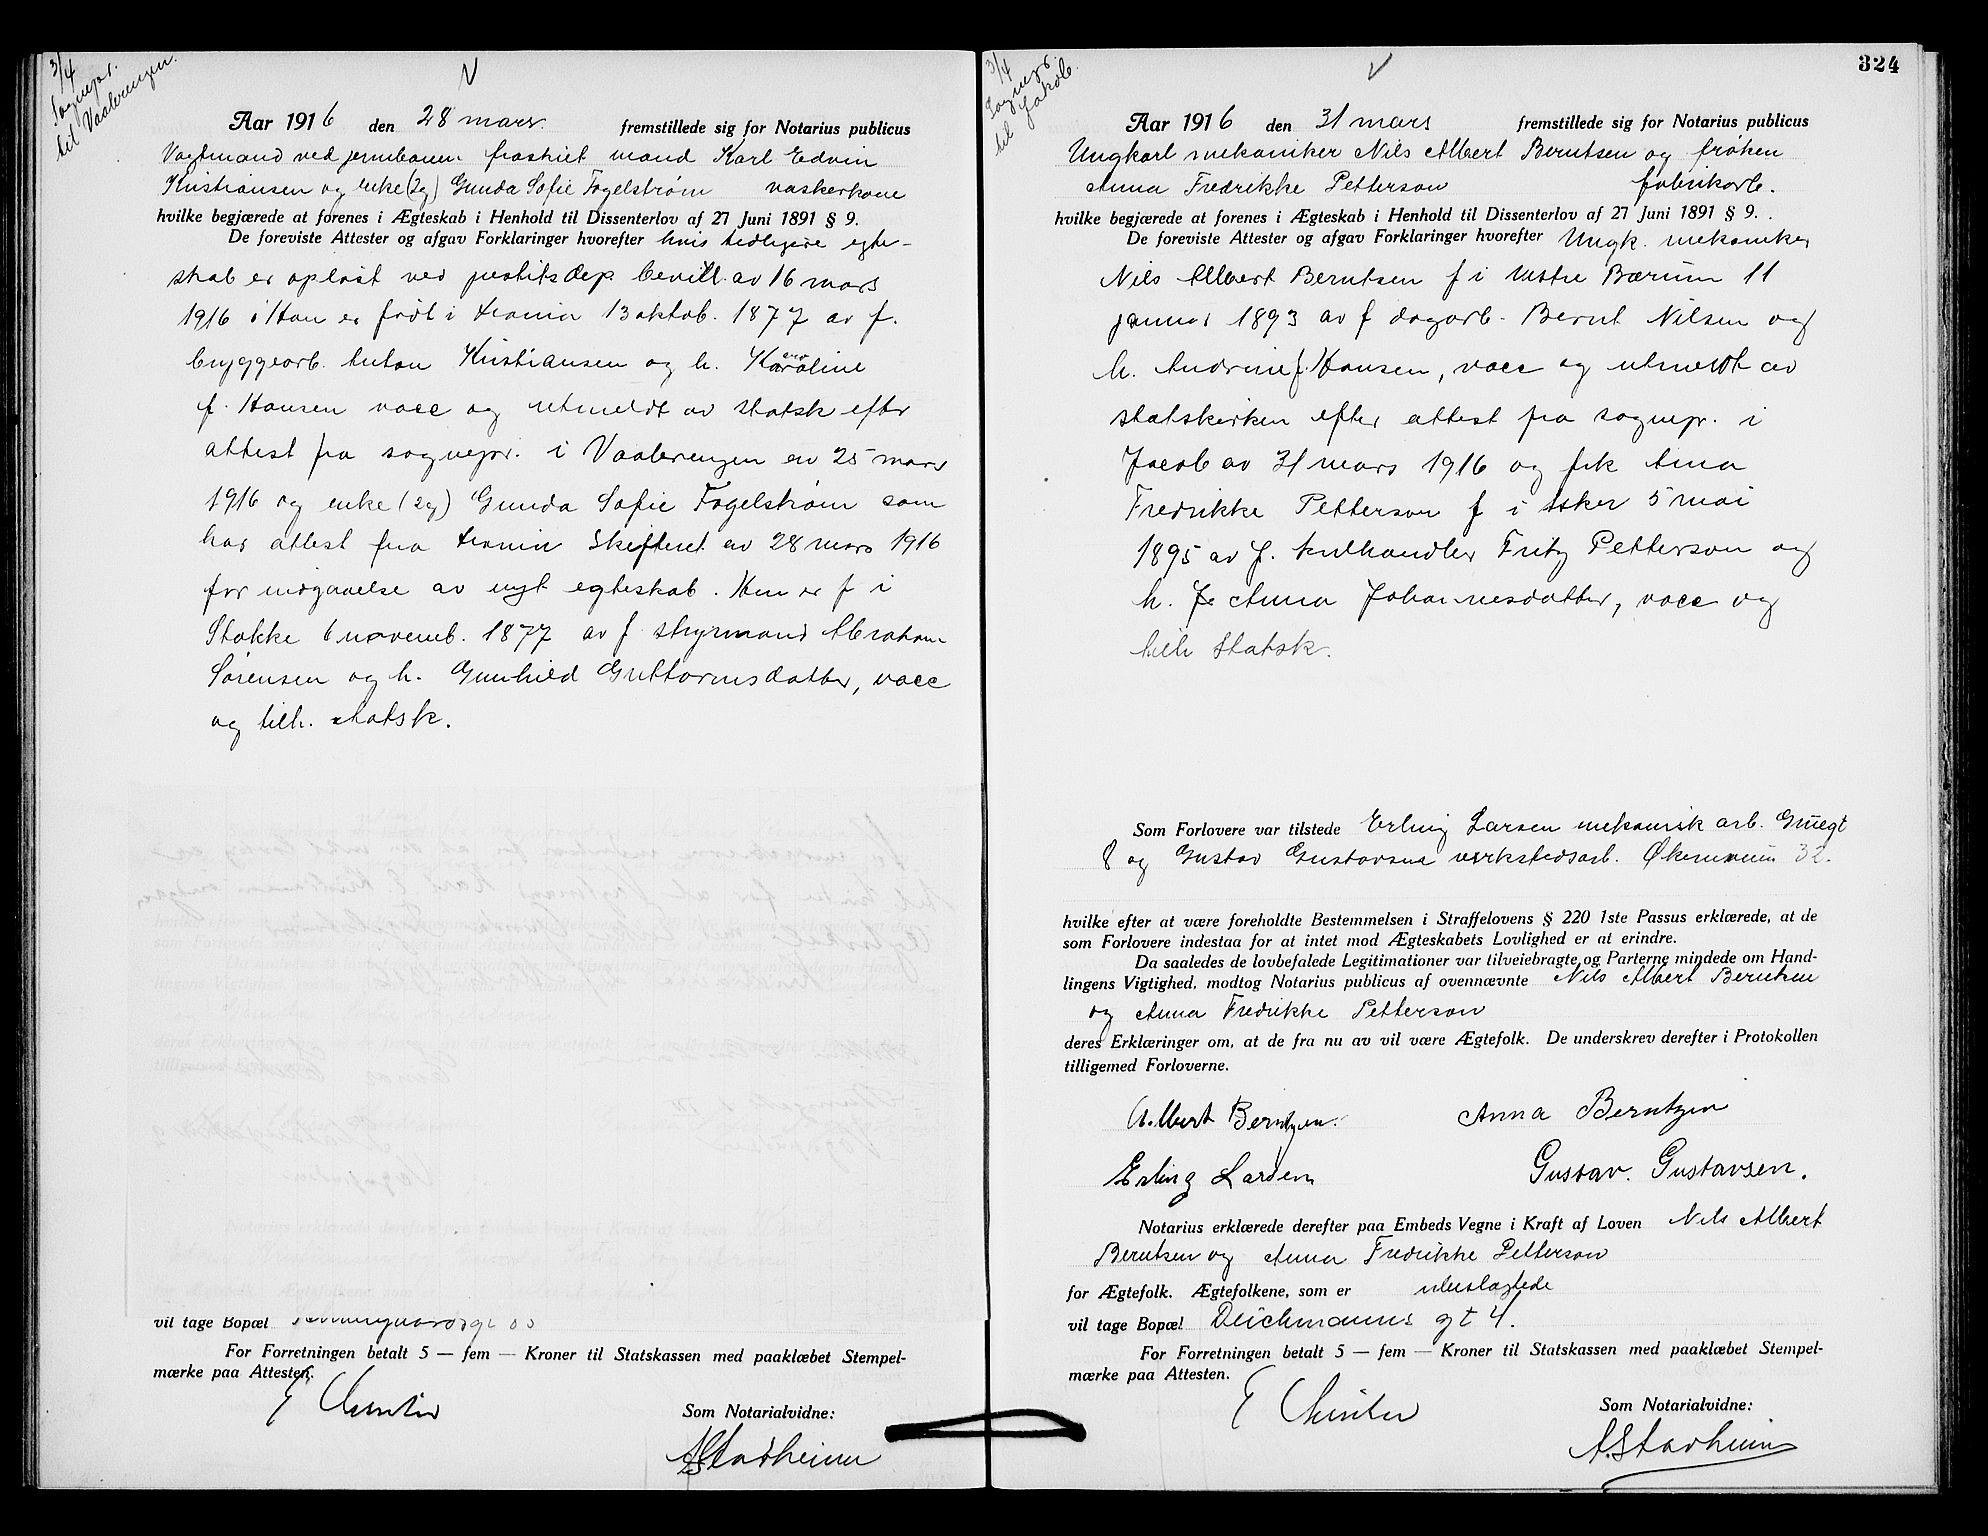 SAO, Oslo byfogd avd. I, L/Lb/Lbb/L0010: Notarialprotokoll, rekke II: Vigsler, 1914-1916, s. 423b-424a